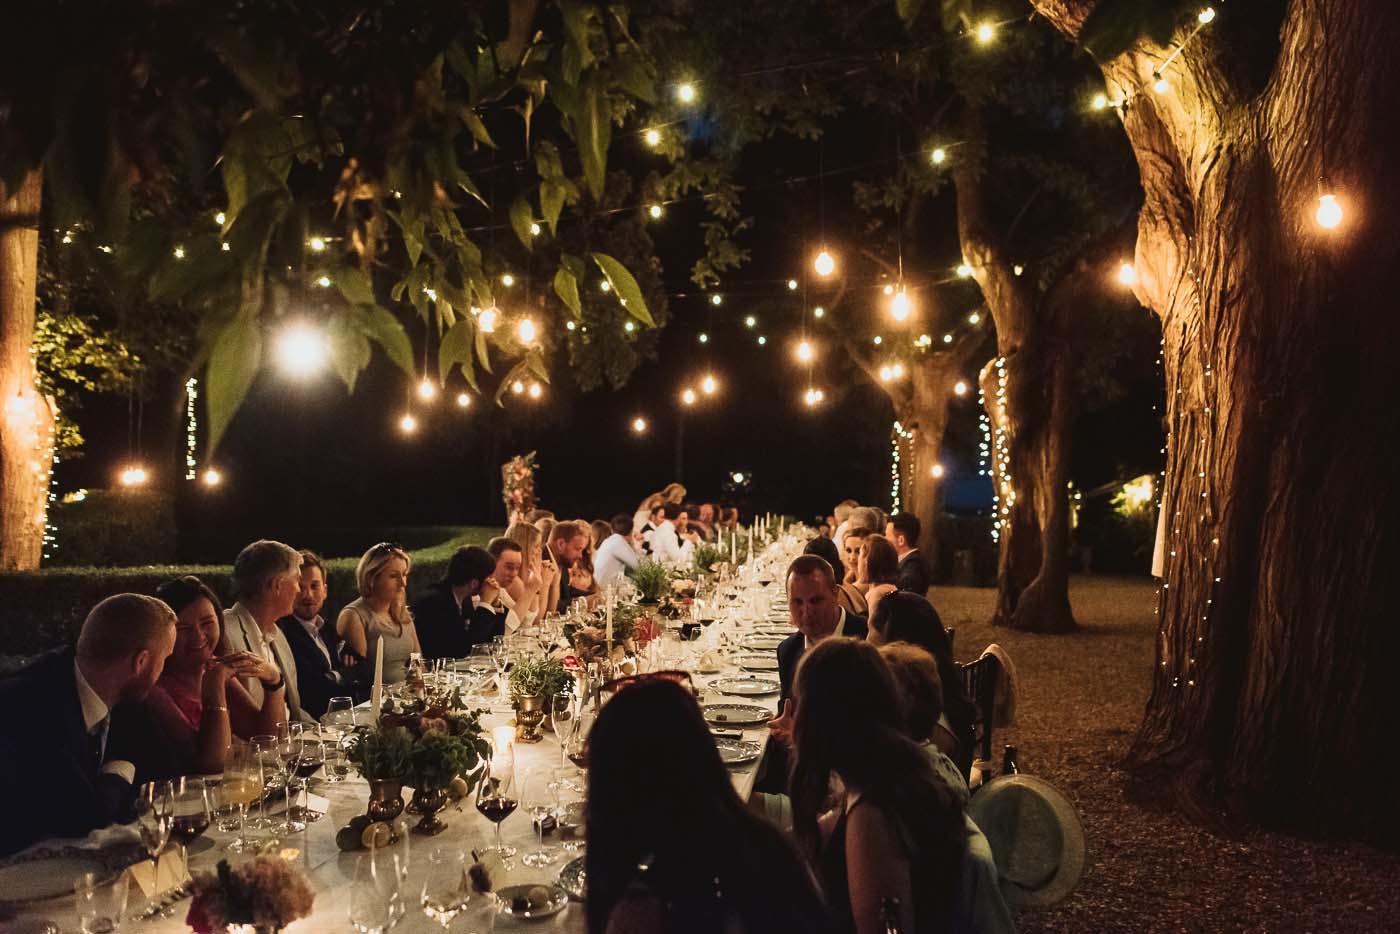 Relaxed-wedding-borgo-stomennano-1198